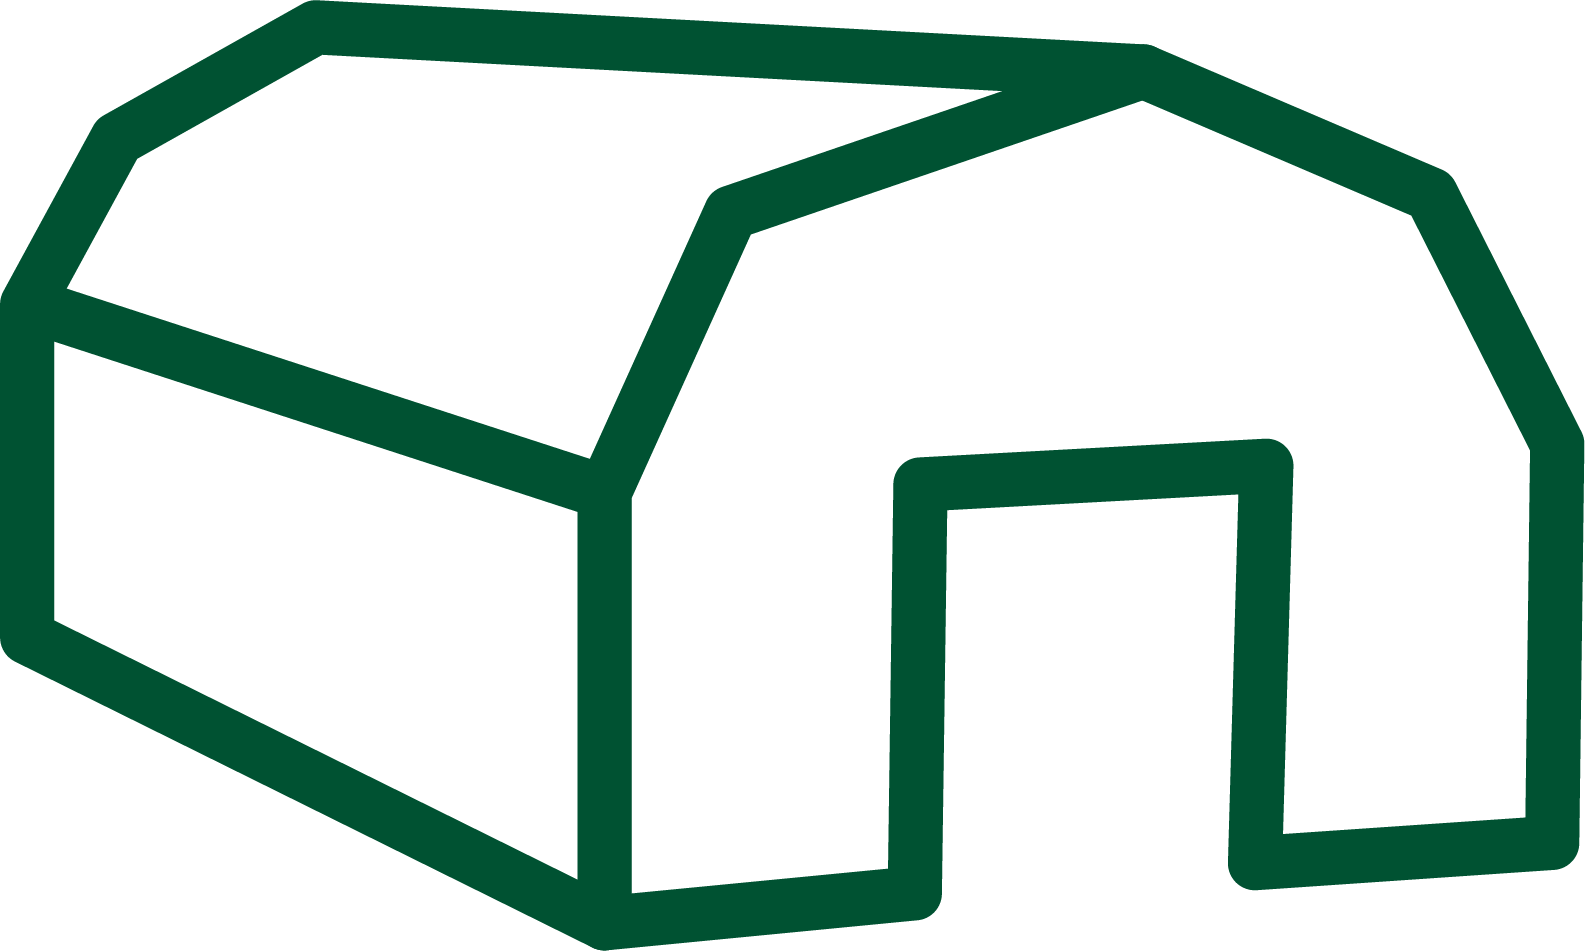 Tält ikon